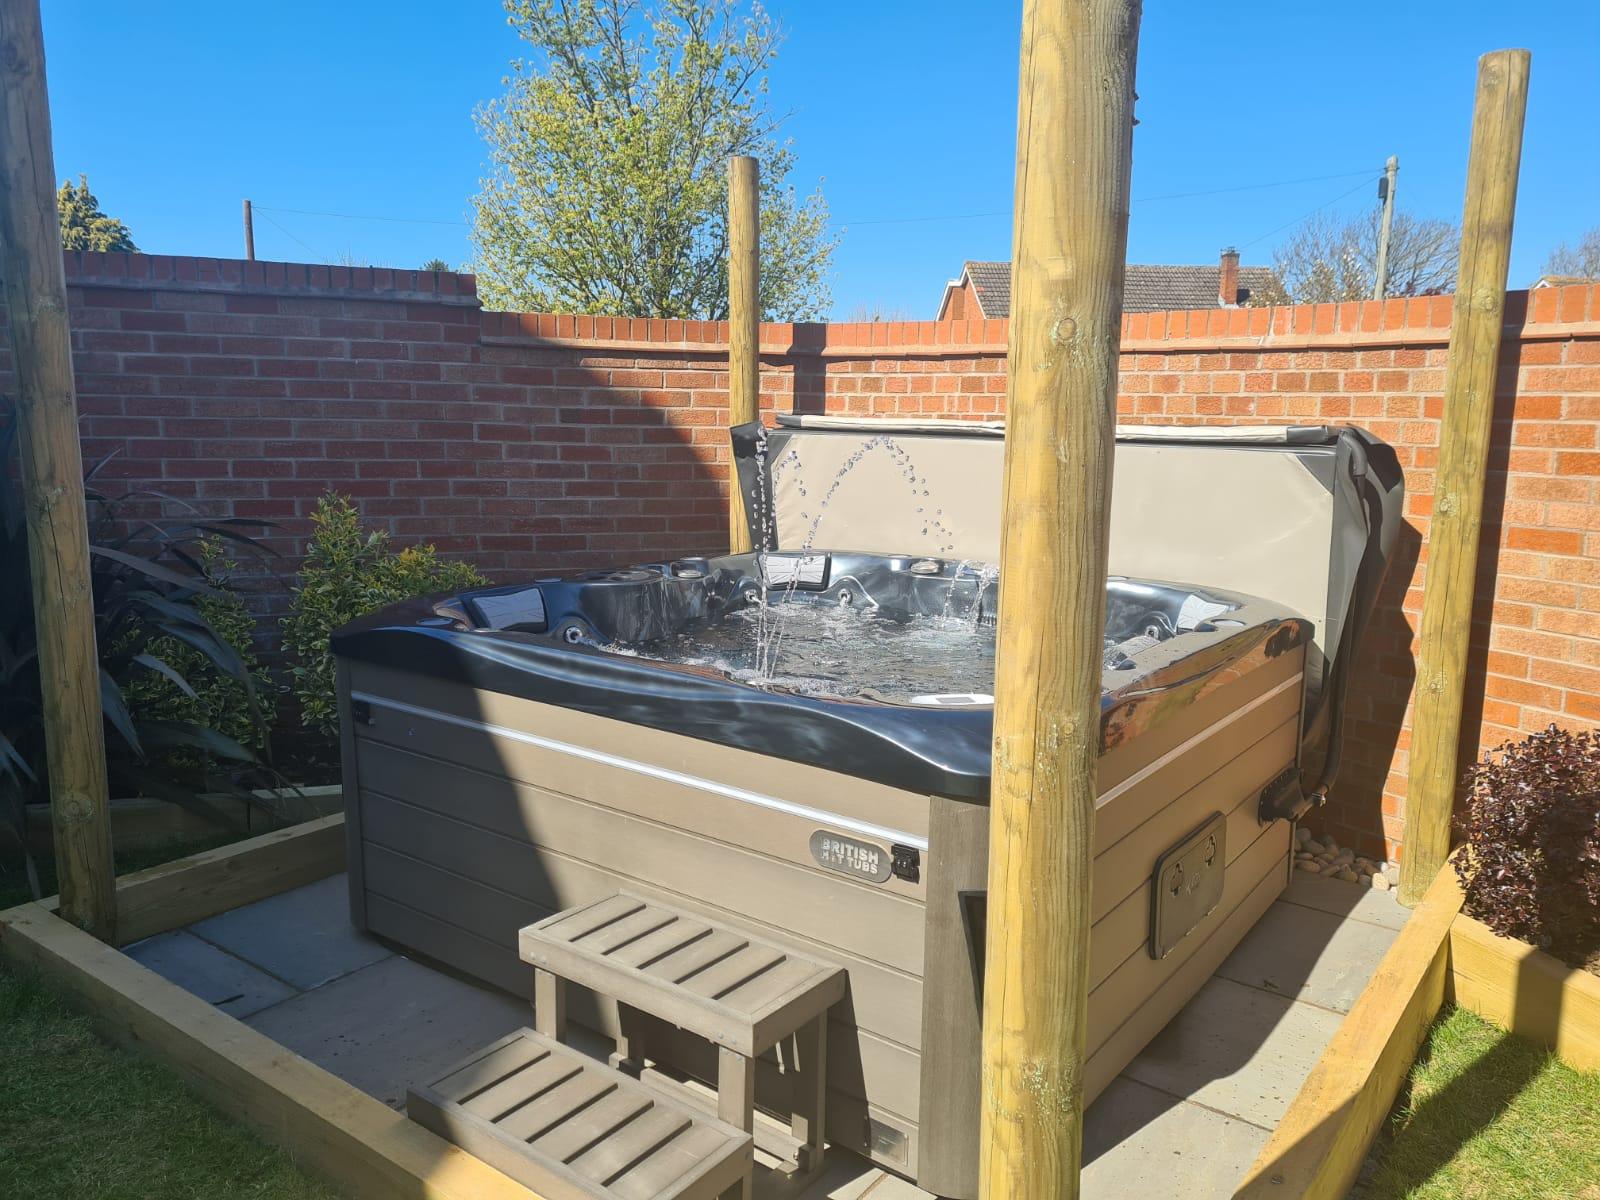 Balmoral Hot Tub Installation